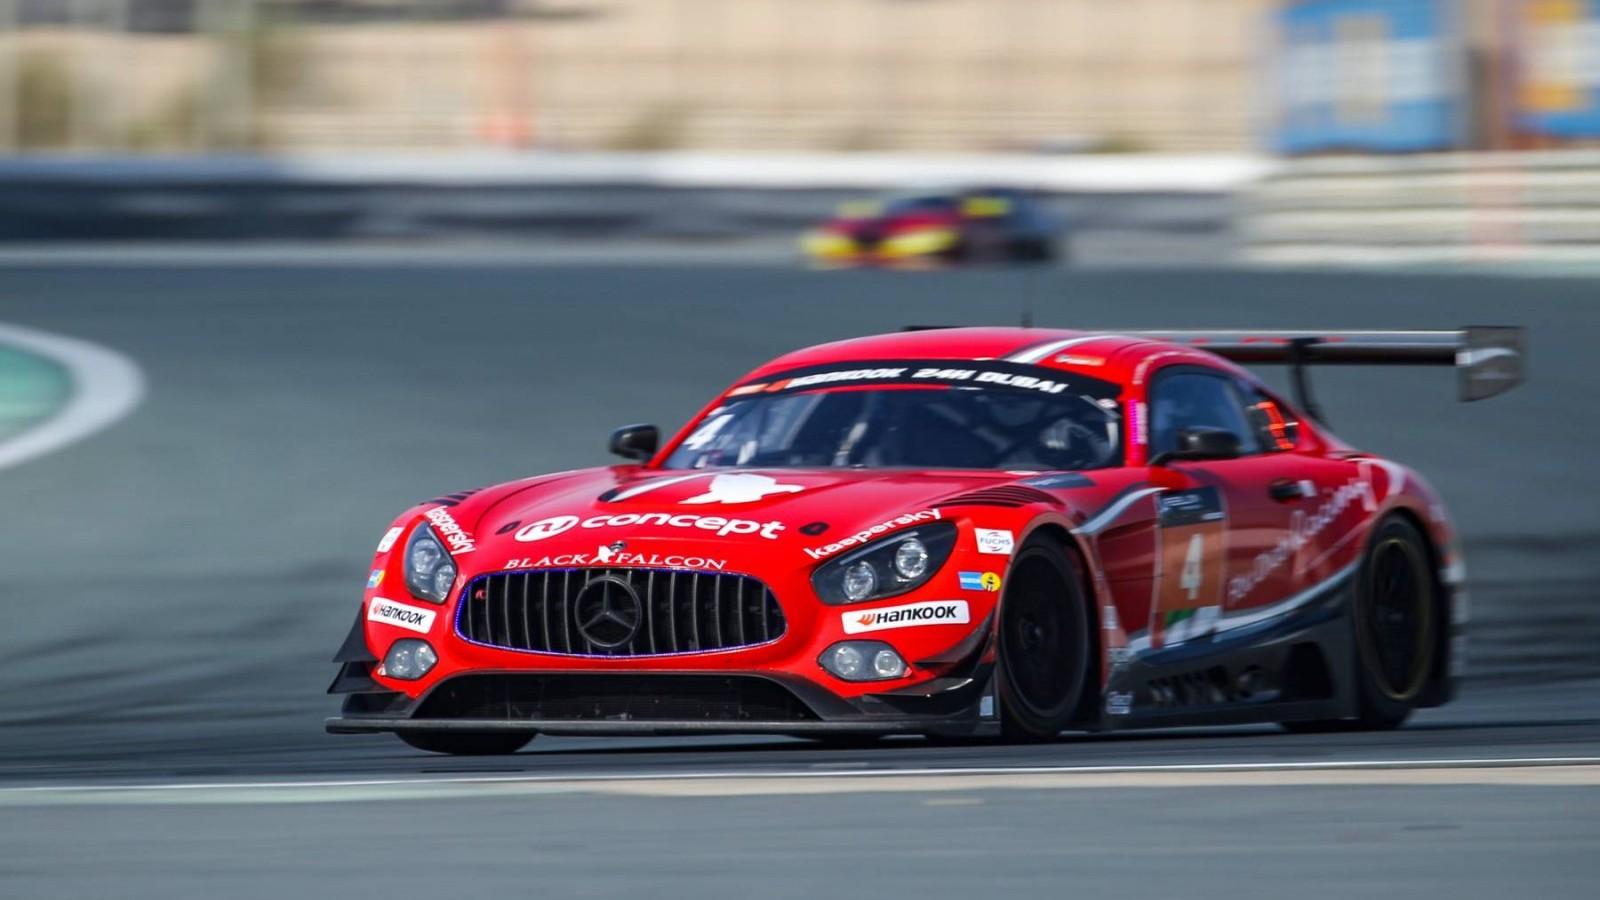 Black Falcon-Mercedes-AMG wint vanwege regen verkorte 15e Hankook 24H DUBAI